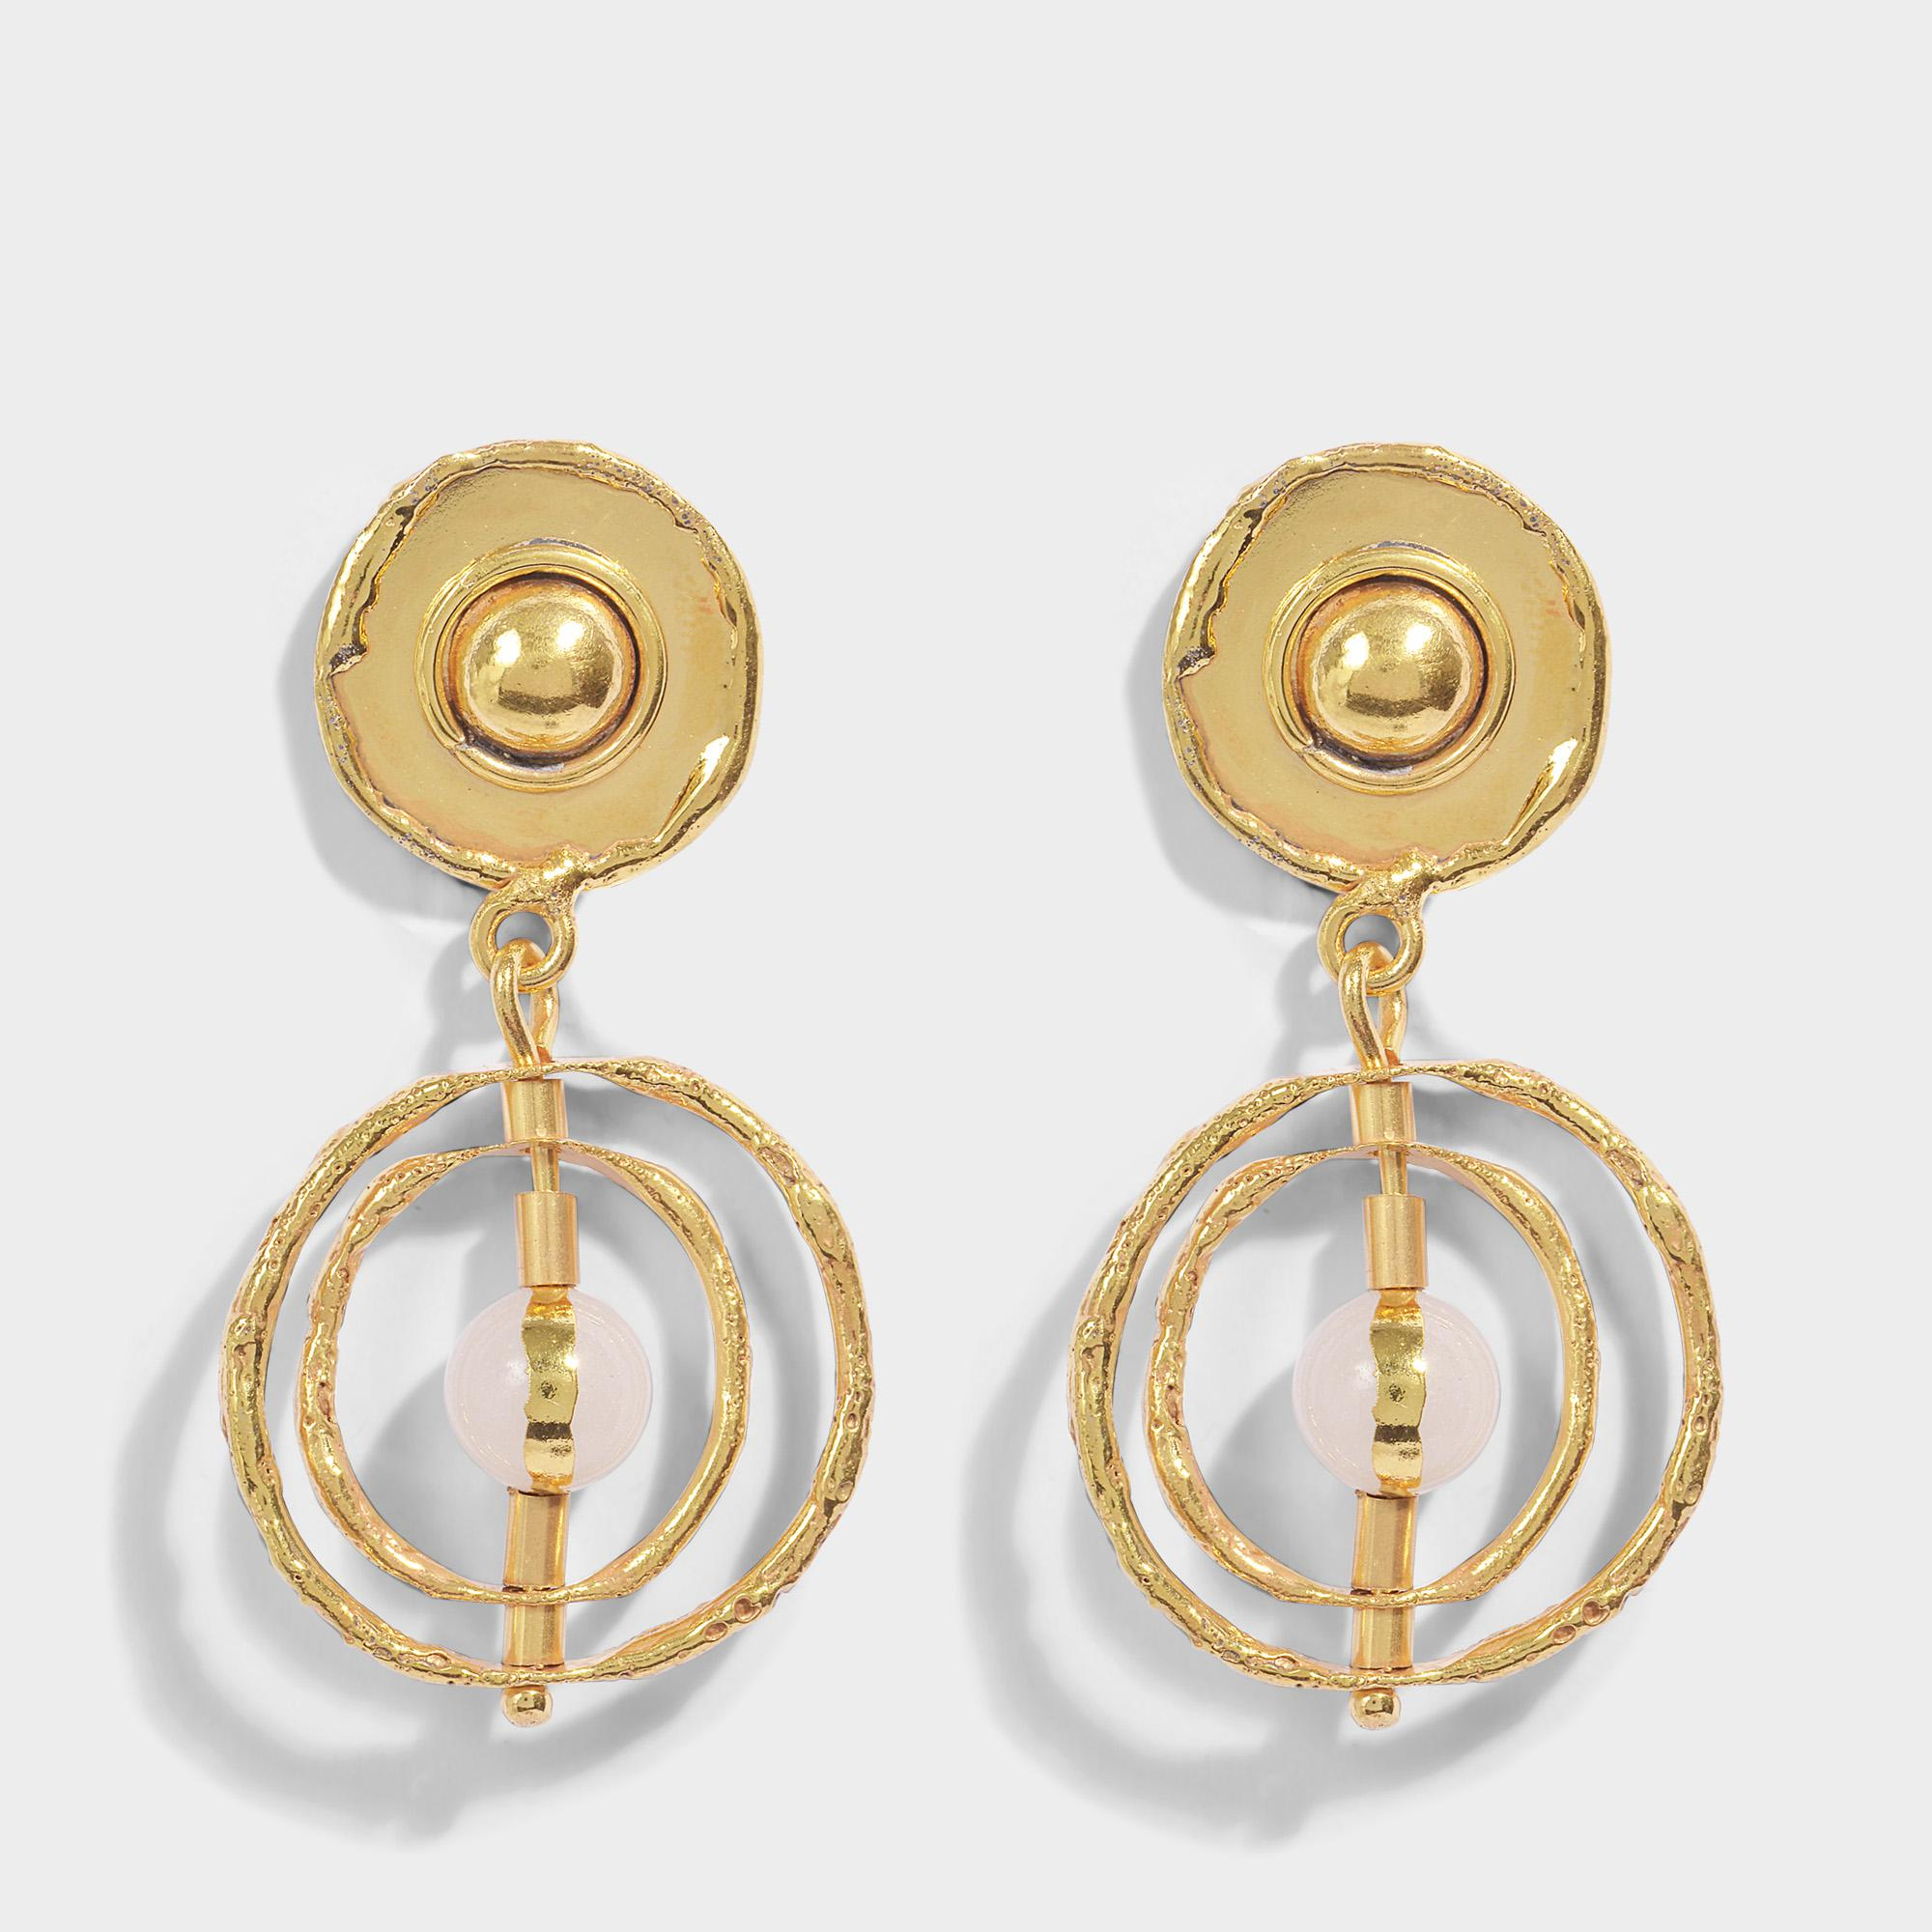 Sylvia Toledano Saturn earrings KdpWHkHI